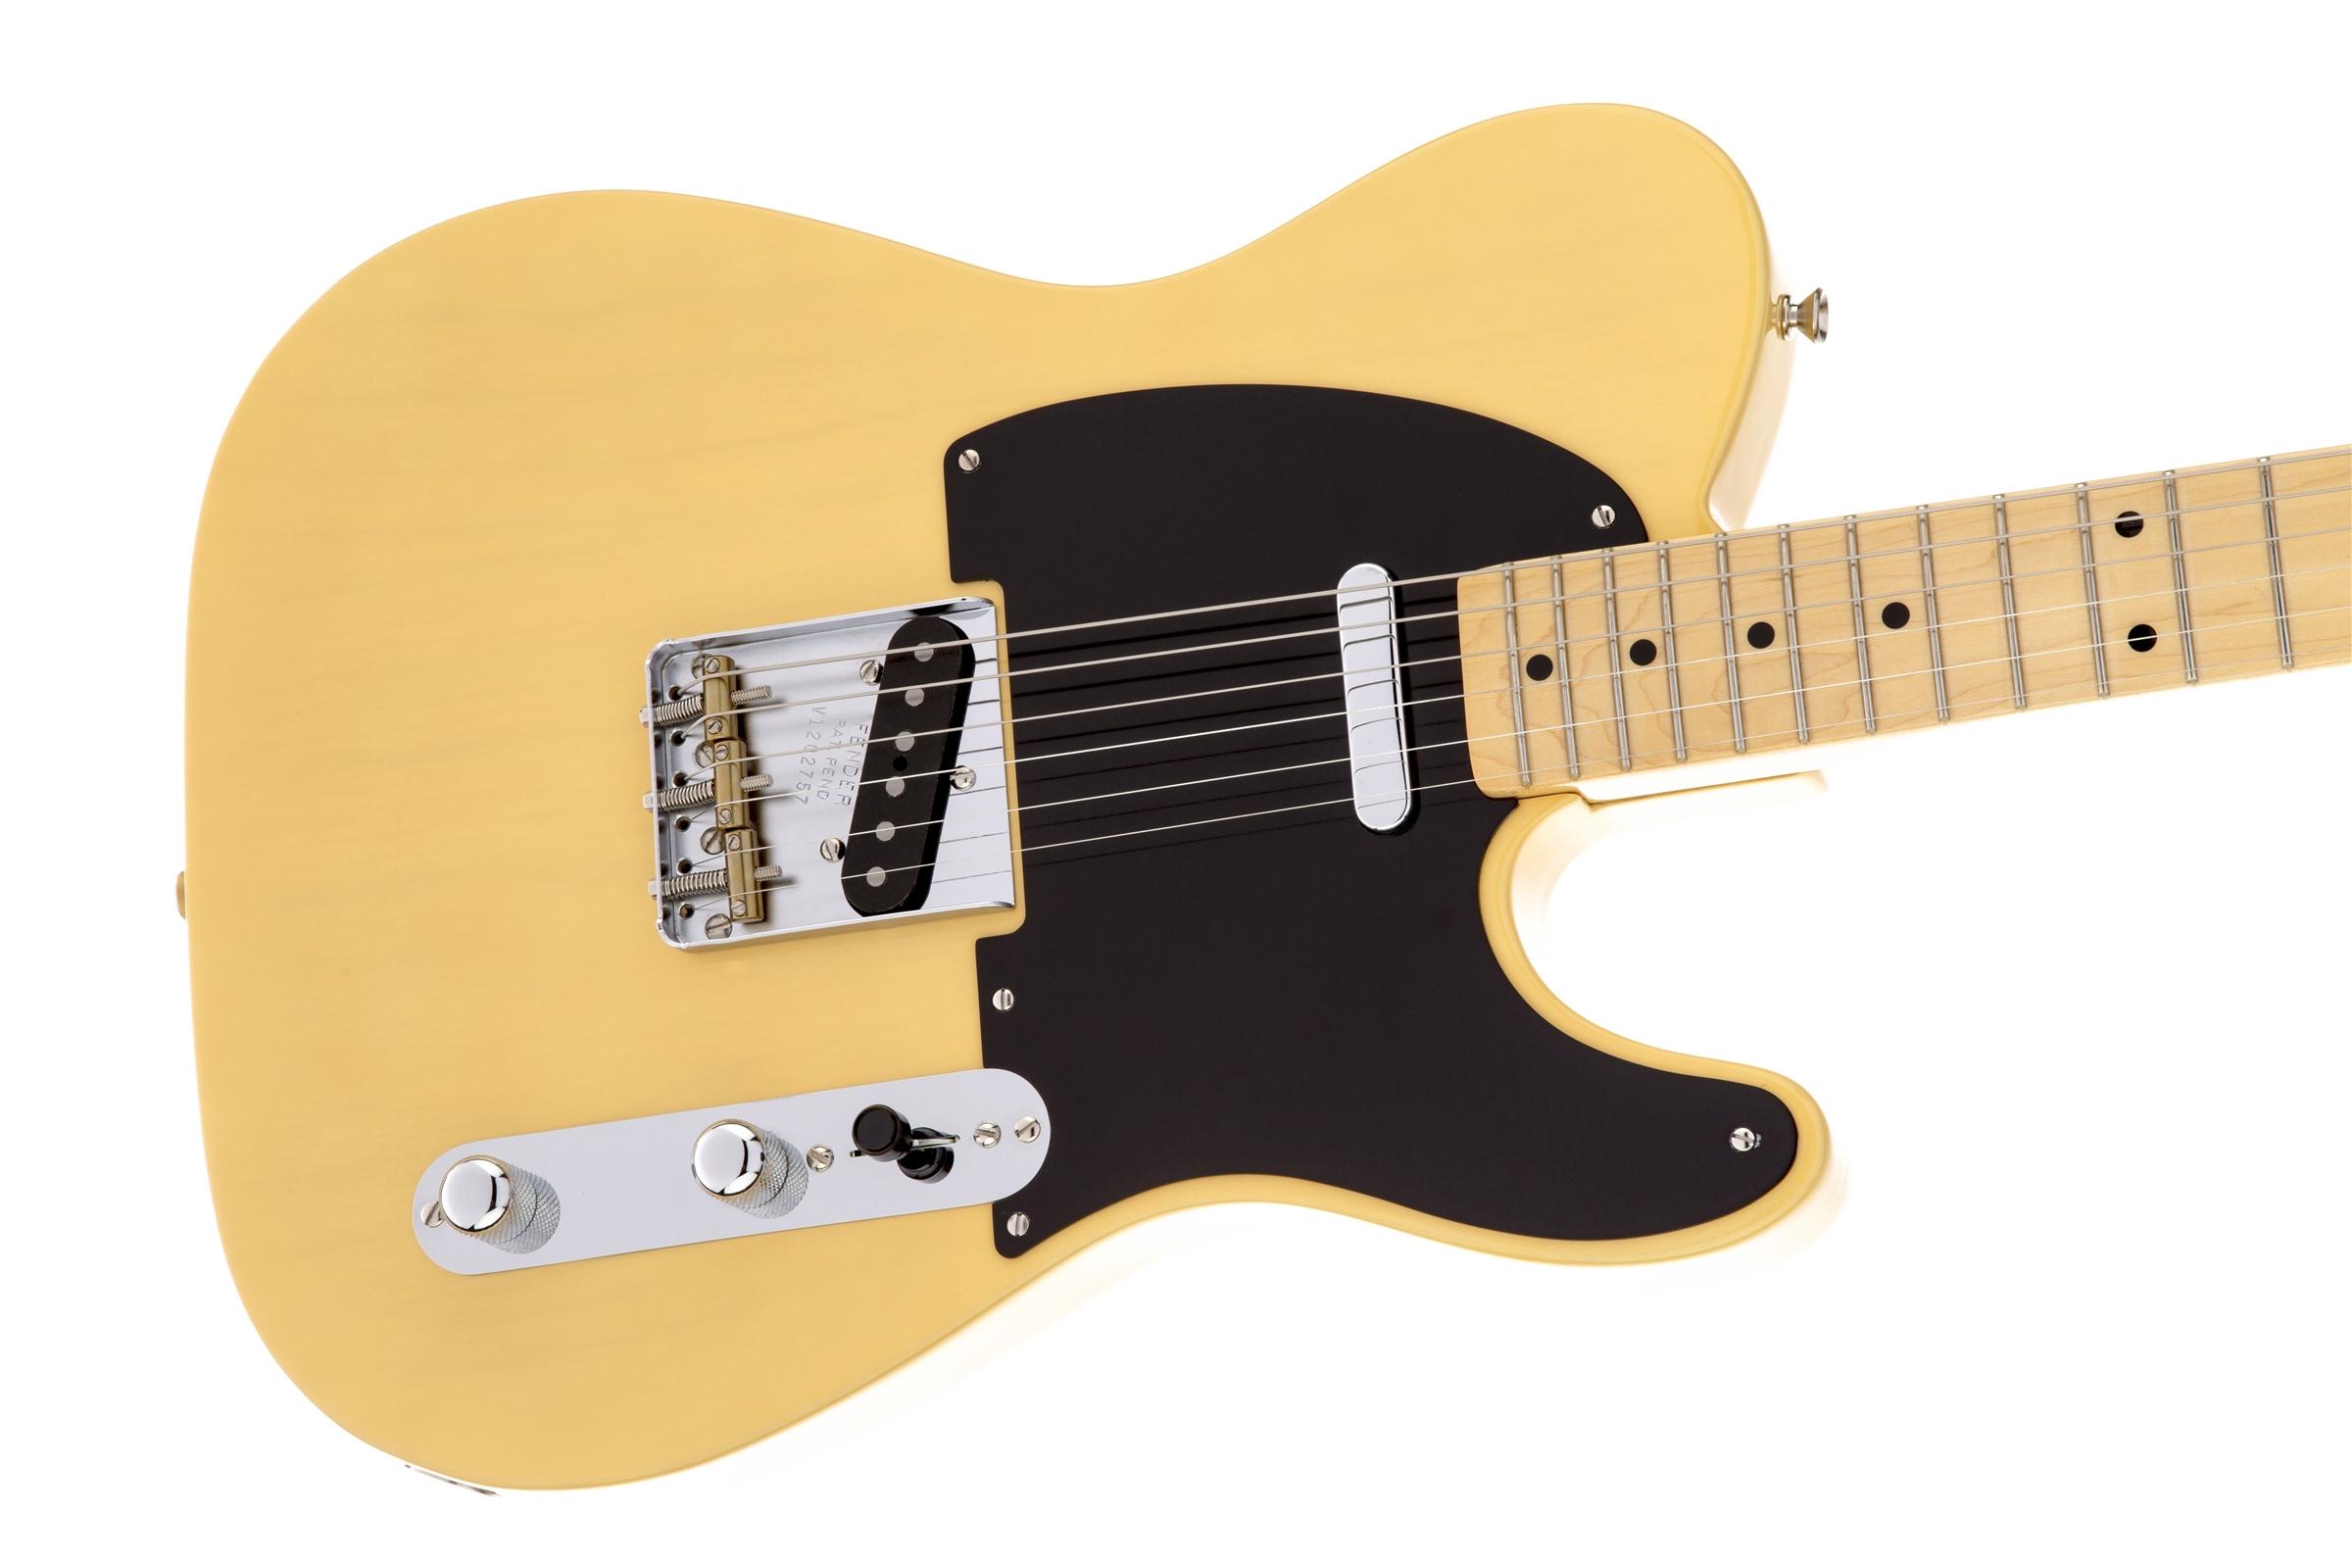 Fender American Vintage 52 Telecaster Electric Guitar